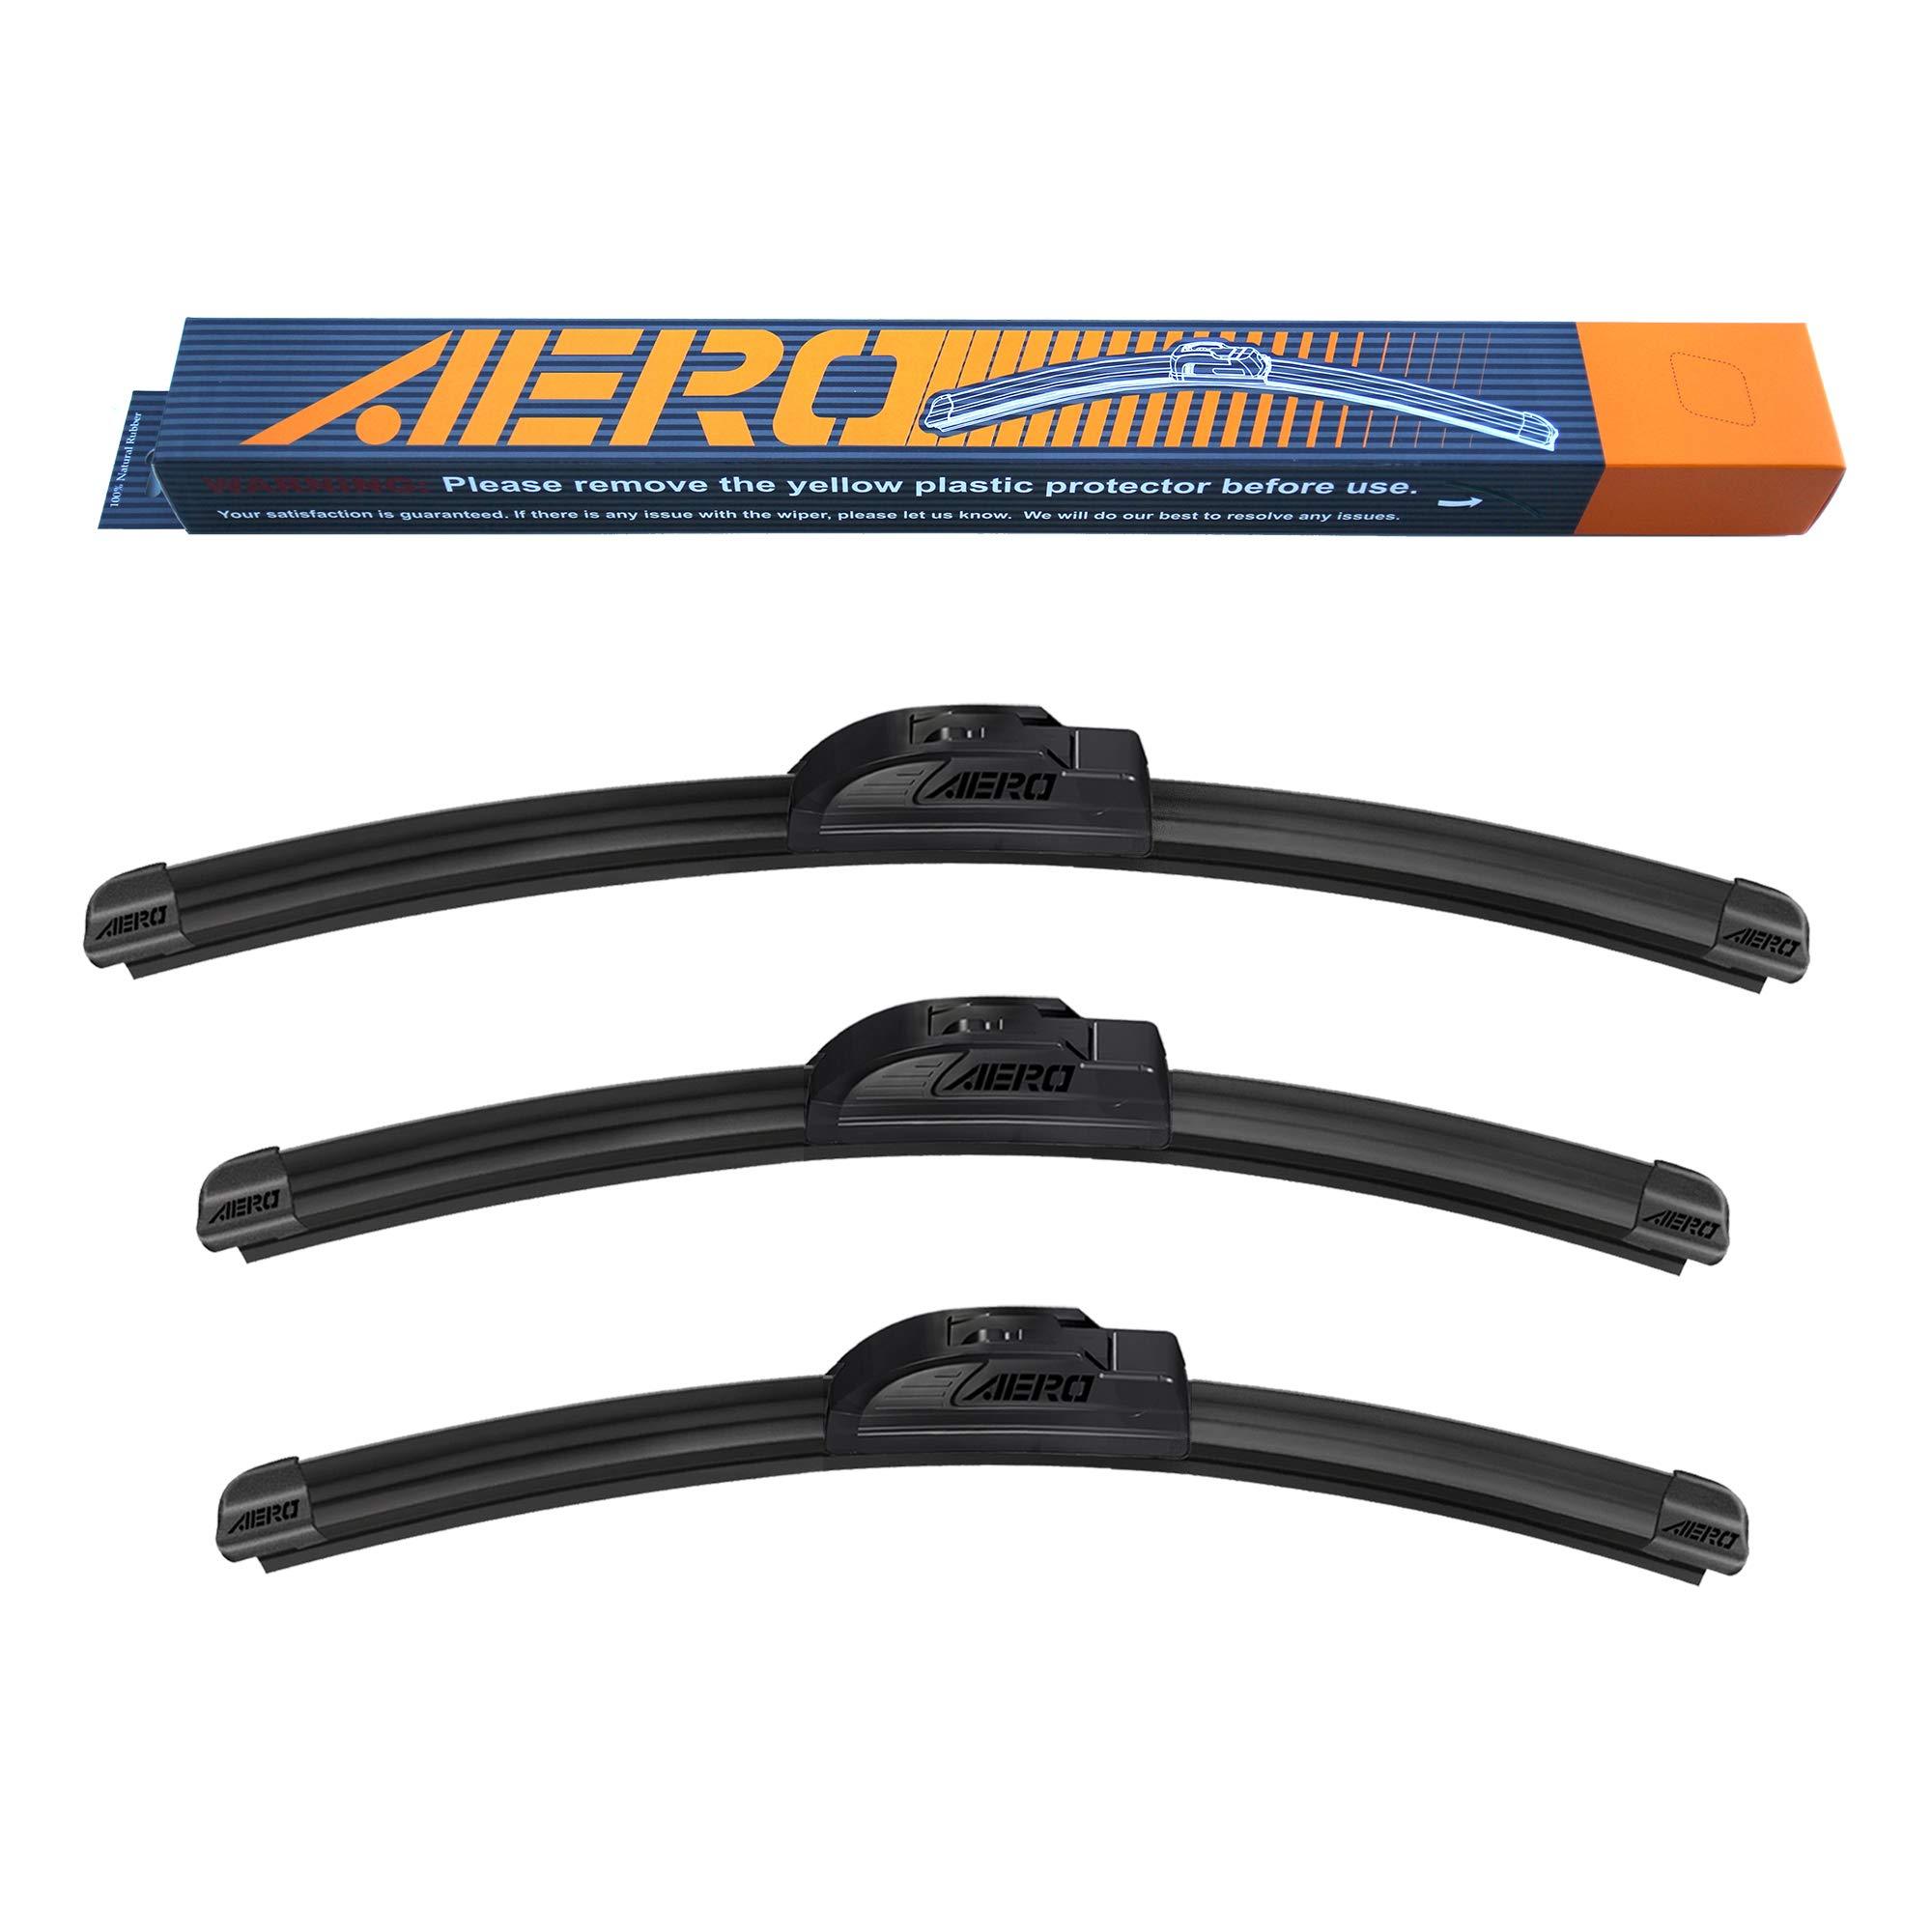 "AERO 16""+14""+14"" Premium All-Season Beam Windshield Wiper Blades OEM Replacement for Toyota FJ Cruiser 2013-2007 (Set of 3)"